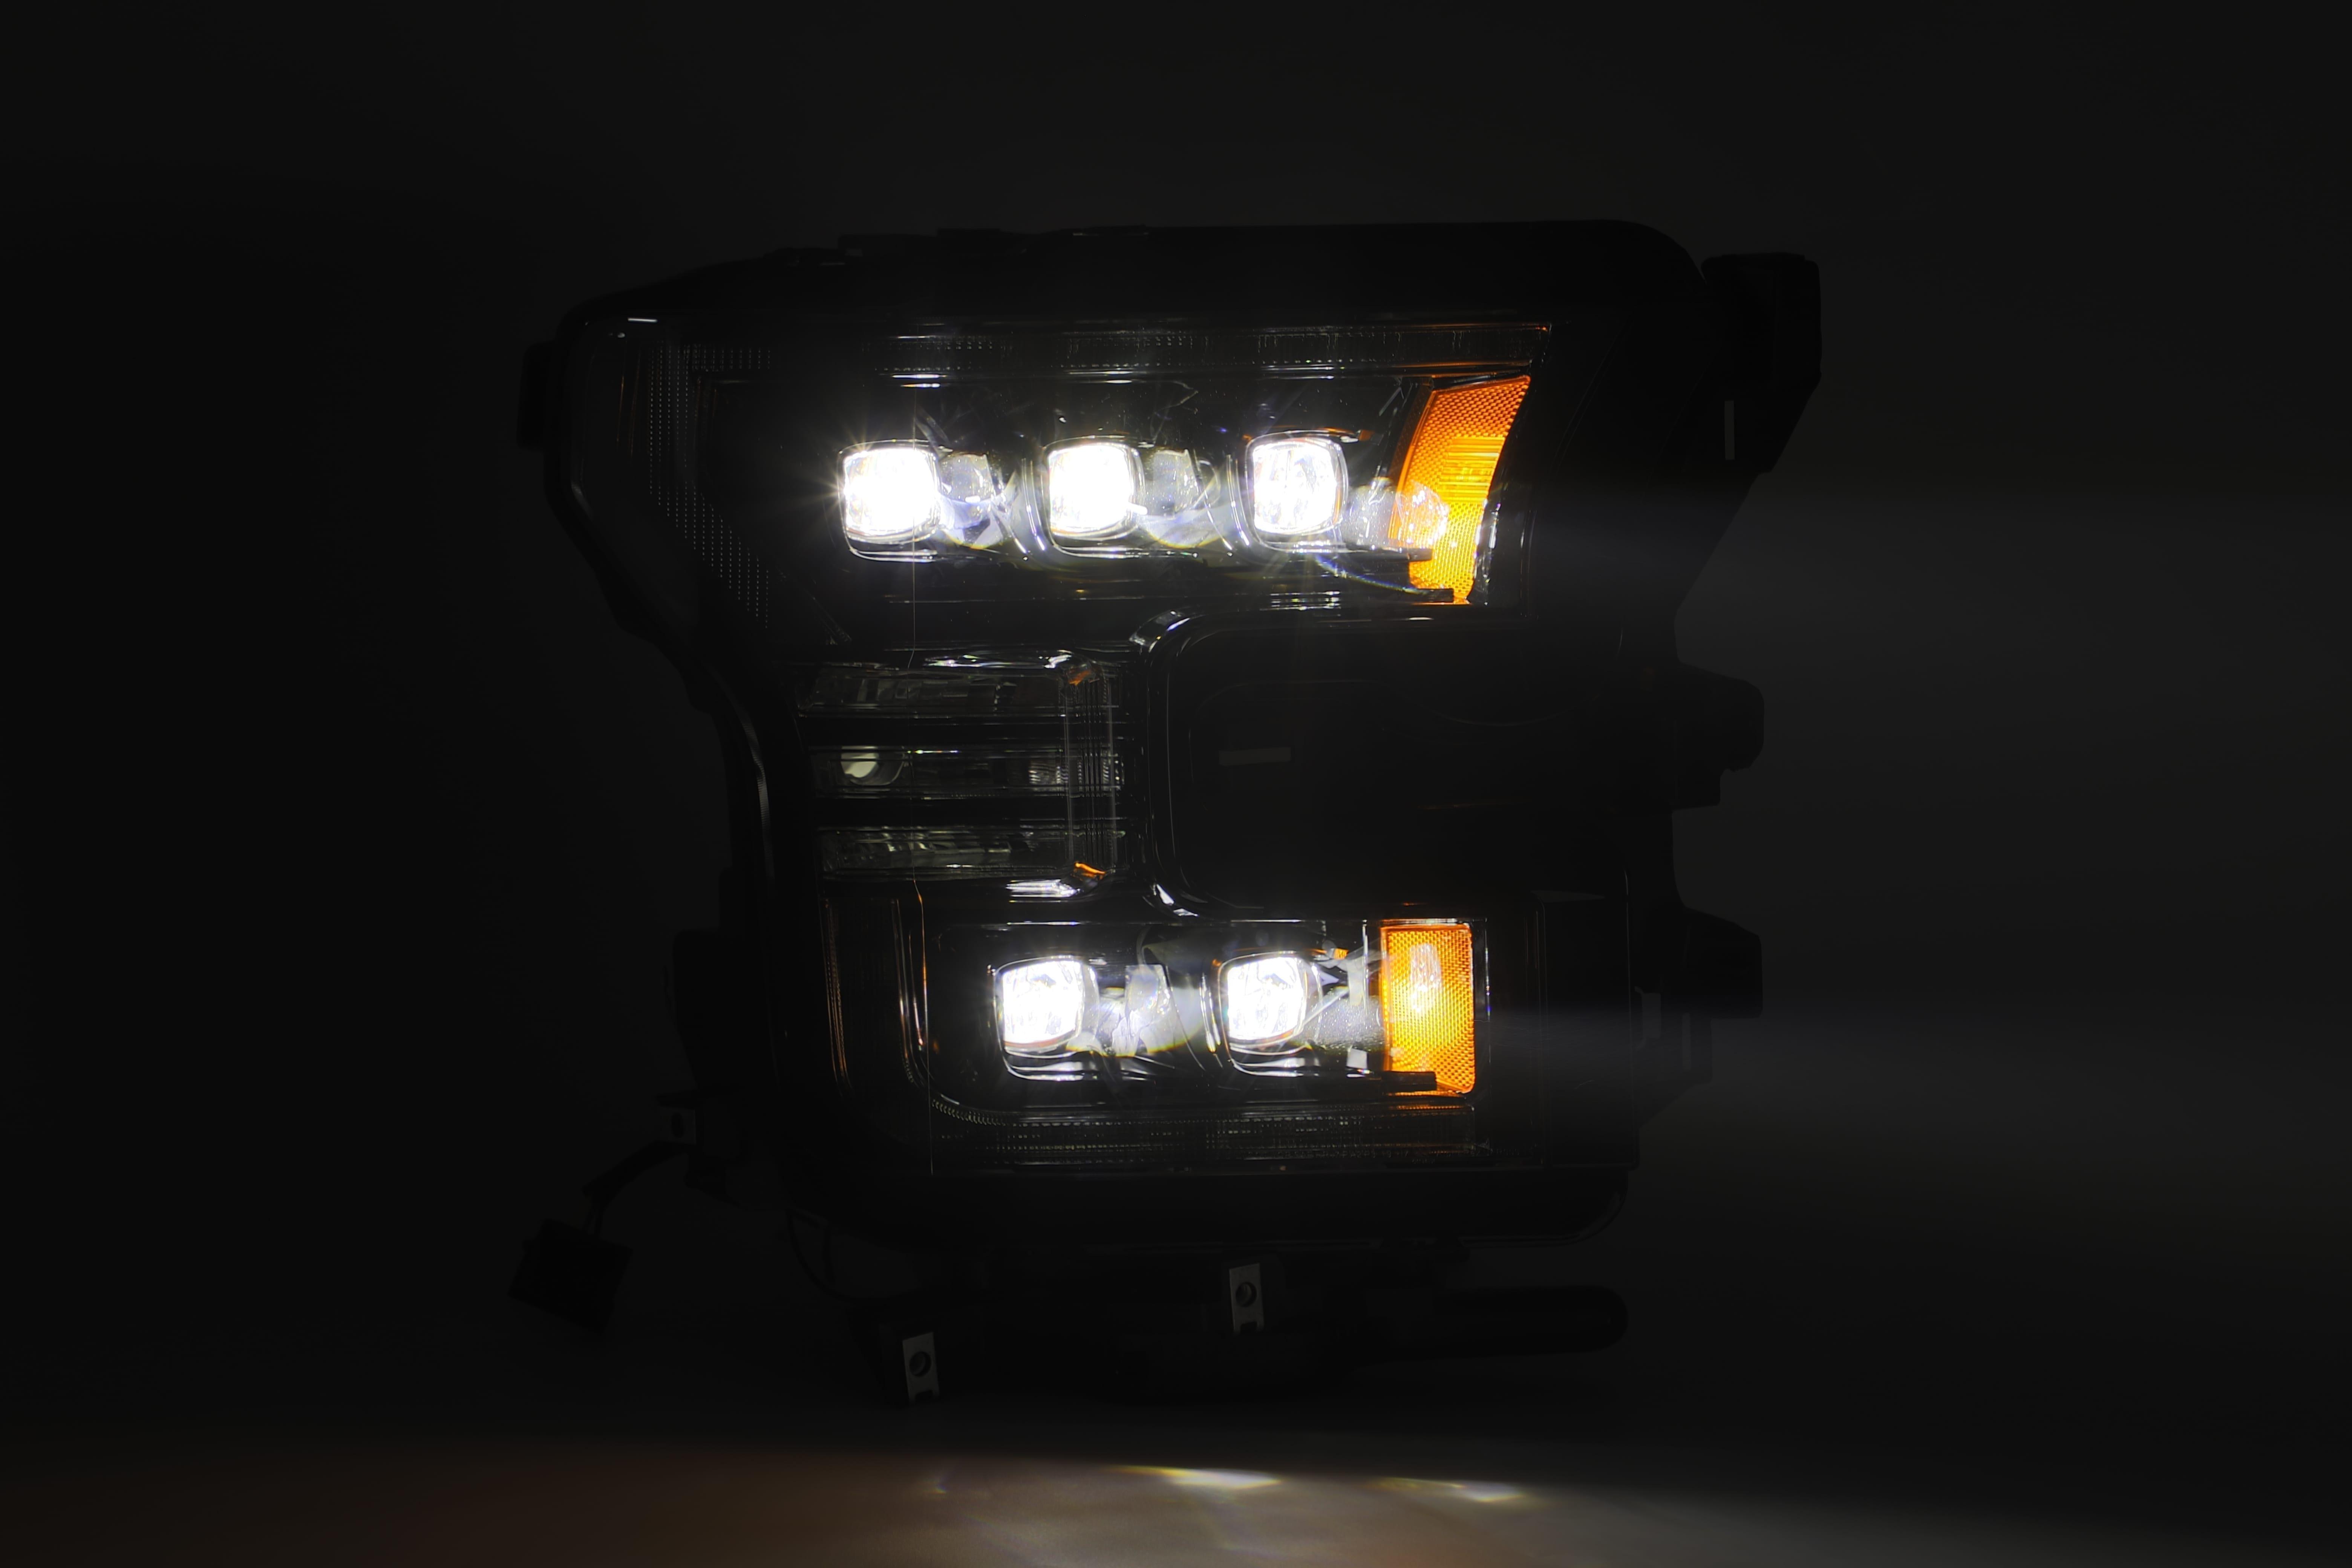 2015 2016 2017 Ford F150 NOVA-Series LED Projector Headlights